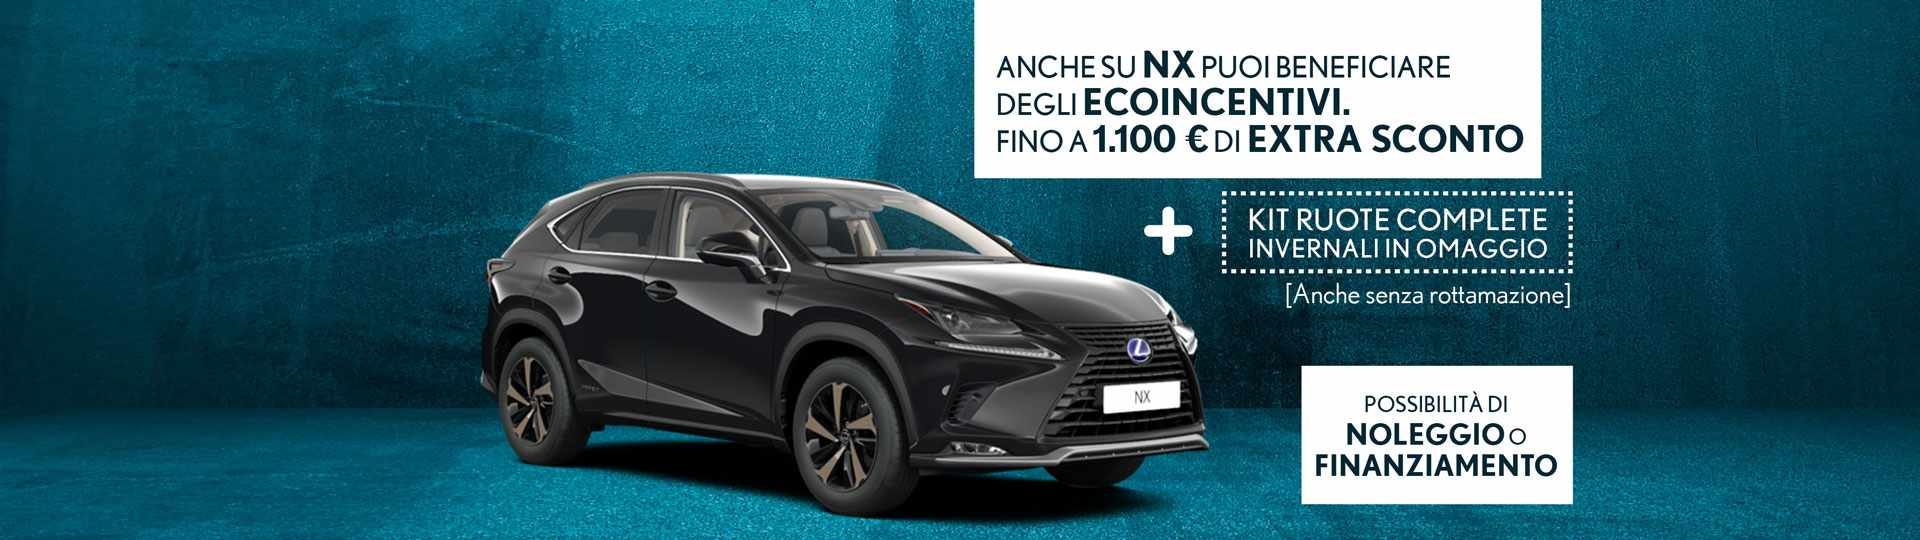 Lexus-NX-ecoincentivi_gennaio-2021-min.jpg